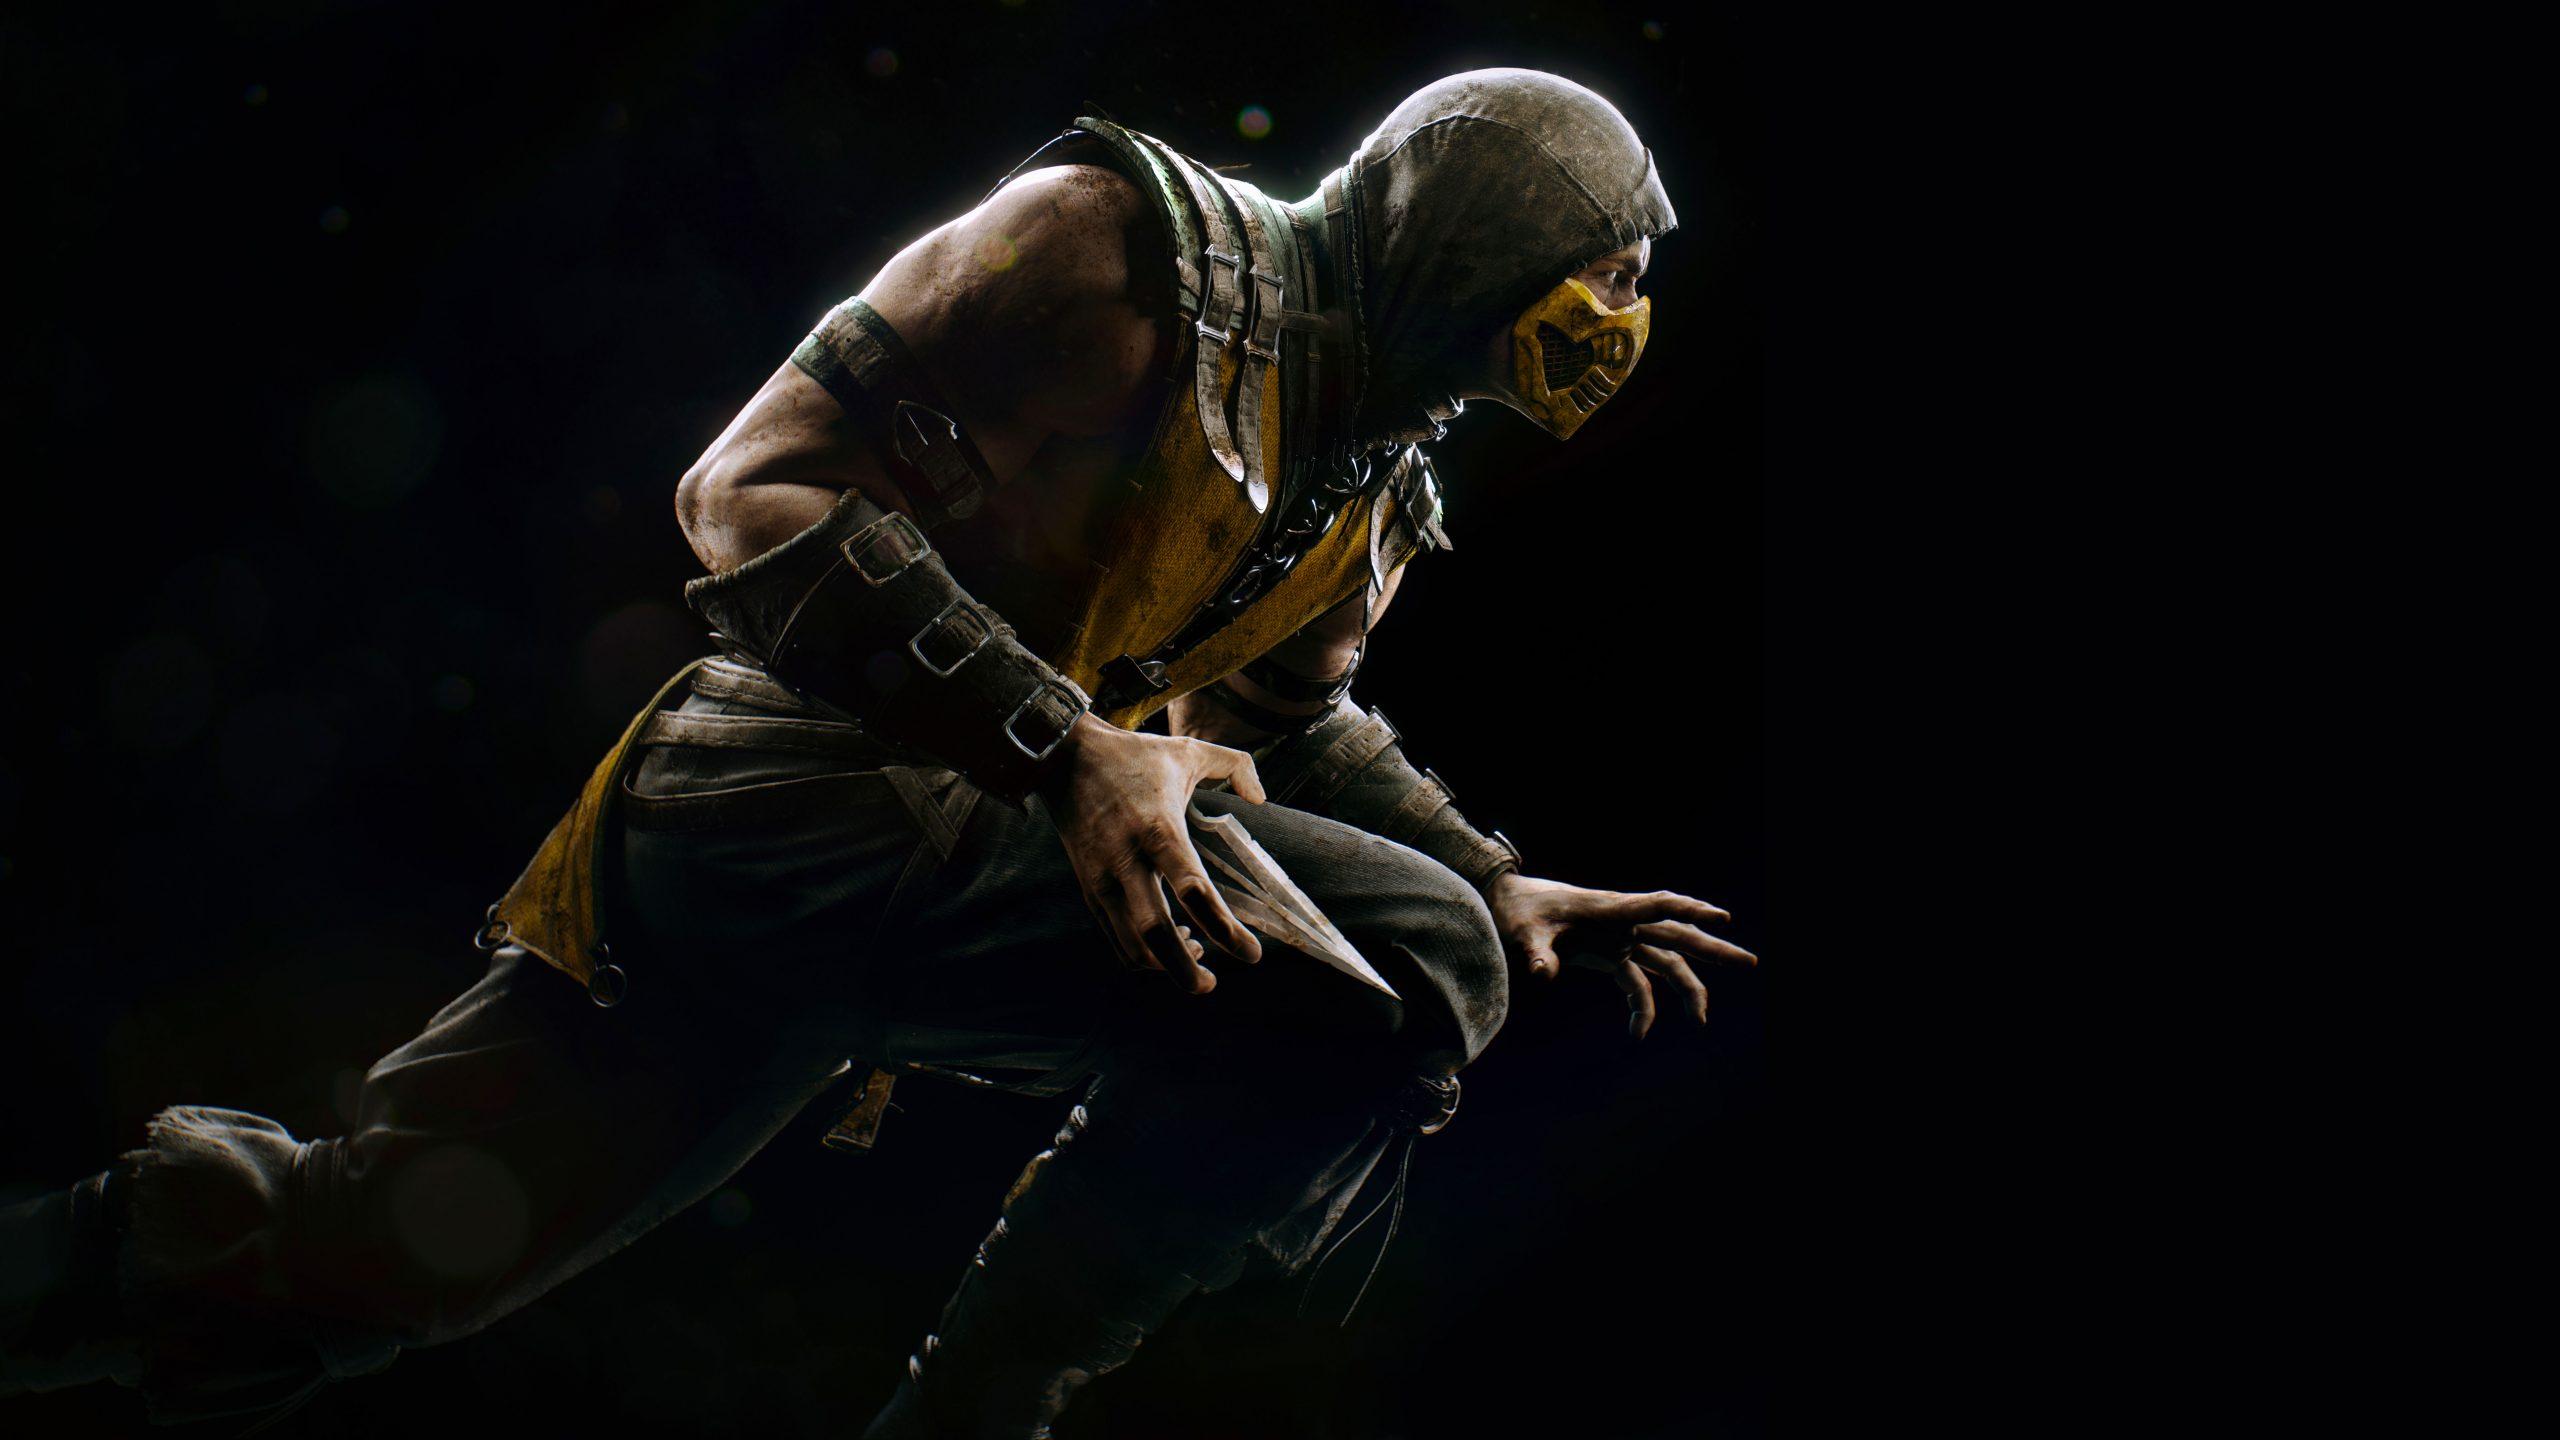 Scorpion Mortal Kombat X Game Ps4 Pc 8k Wallpaper Best Wallpapers